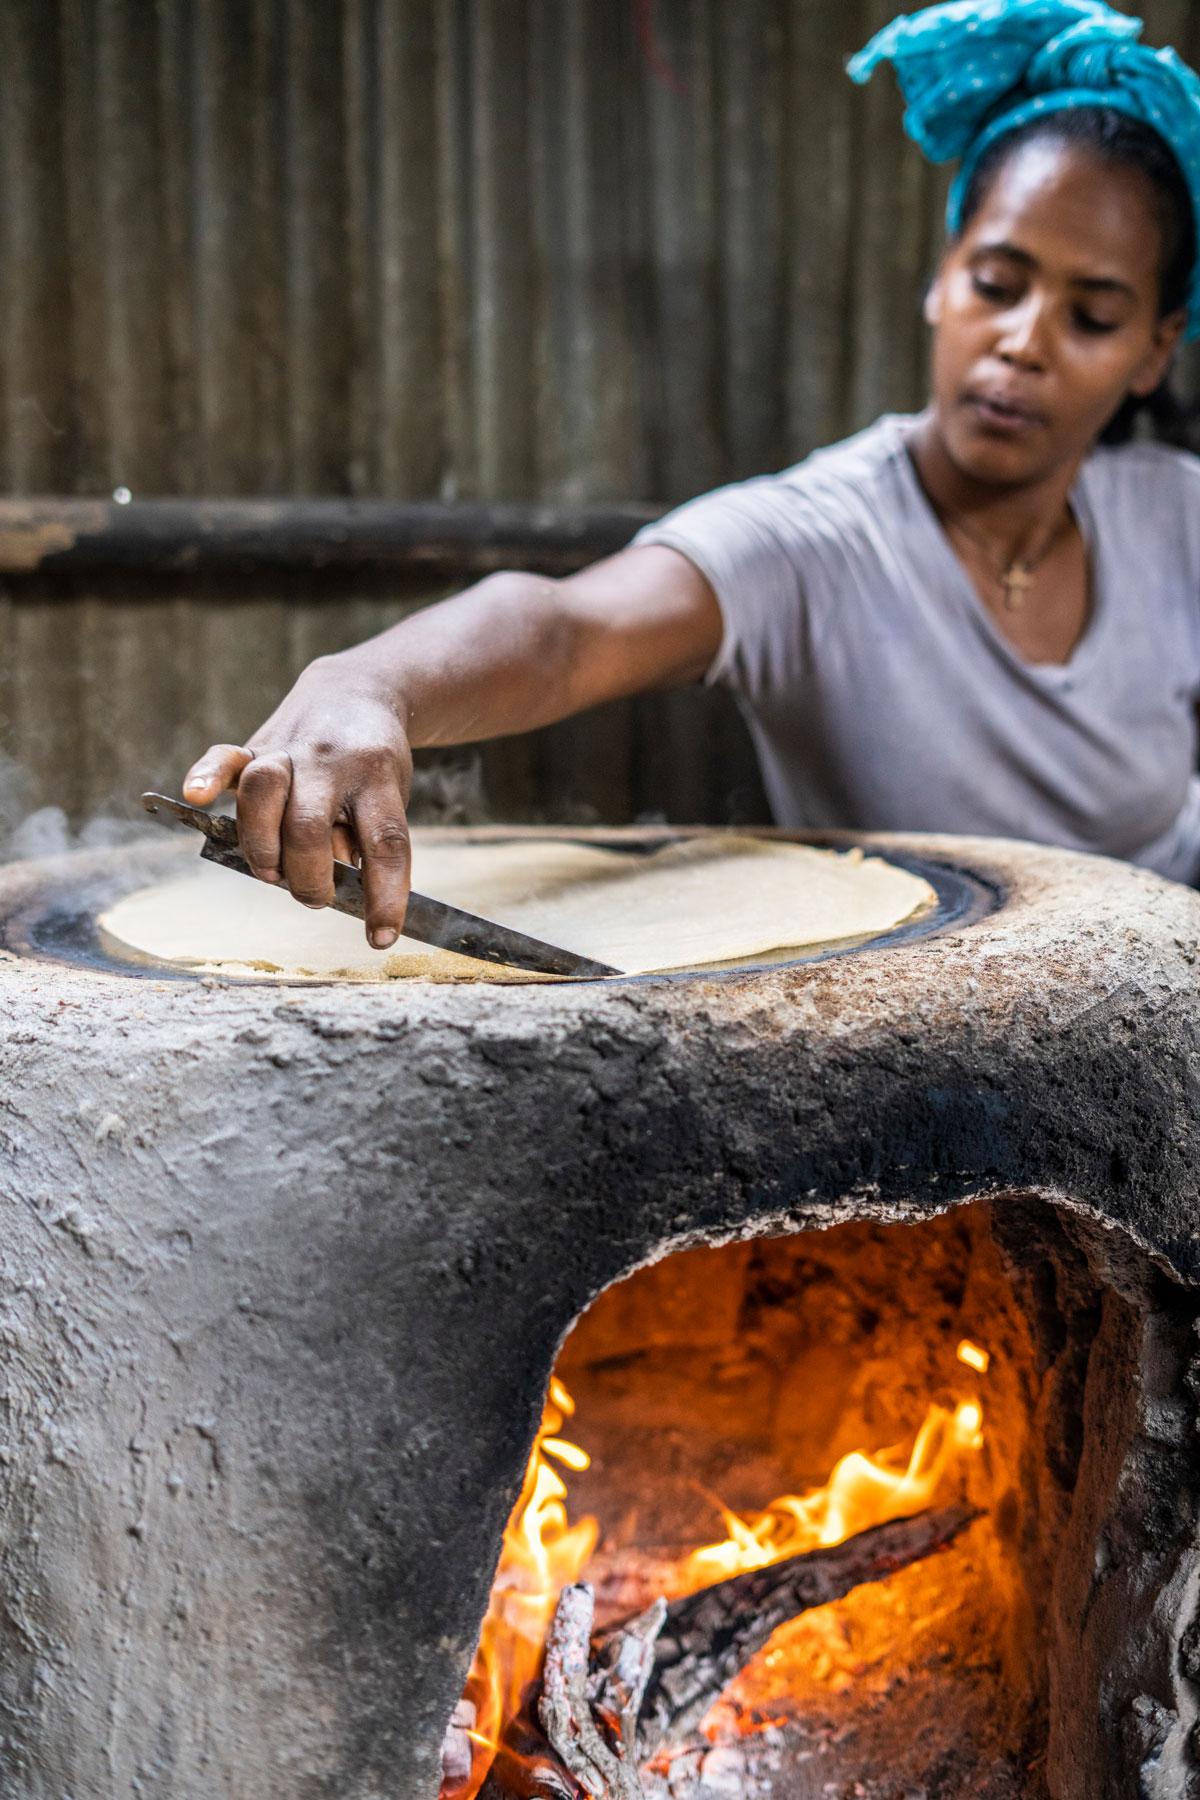 A person making Ethiopian flatbread.